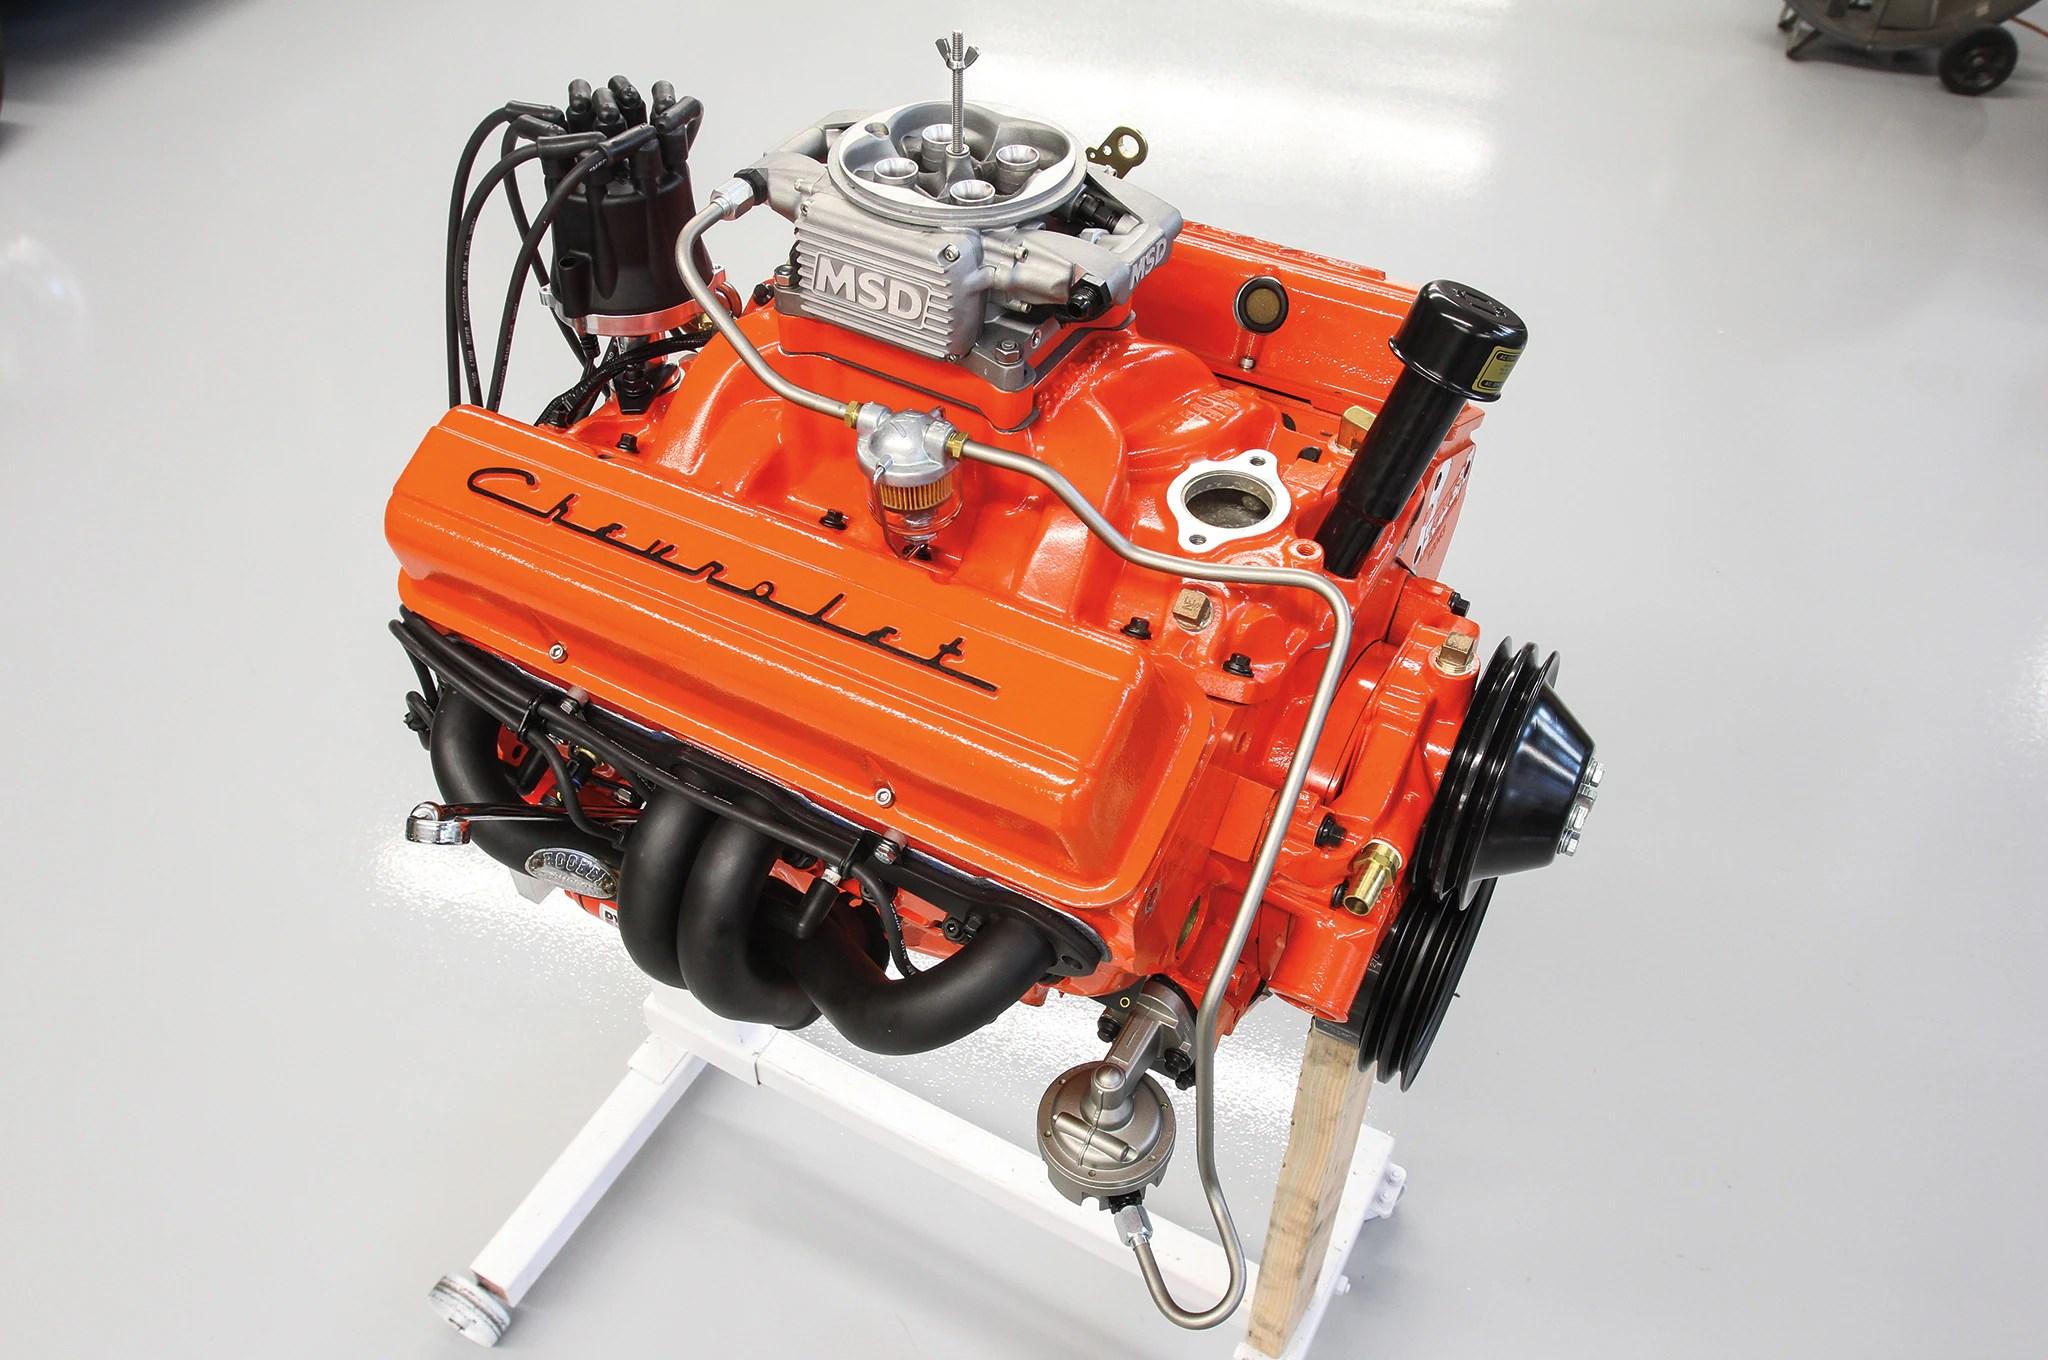 delco fuel filter 1999 mustang cobra best wiring library  Delco Fuel Filter 1999 Mustang Cobra #2